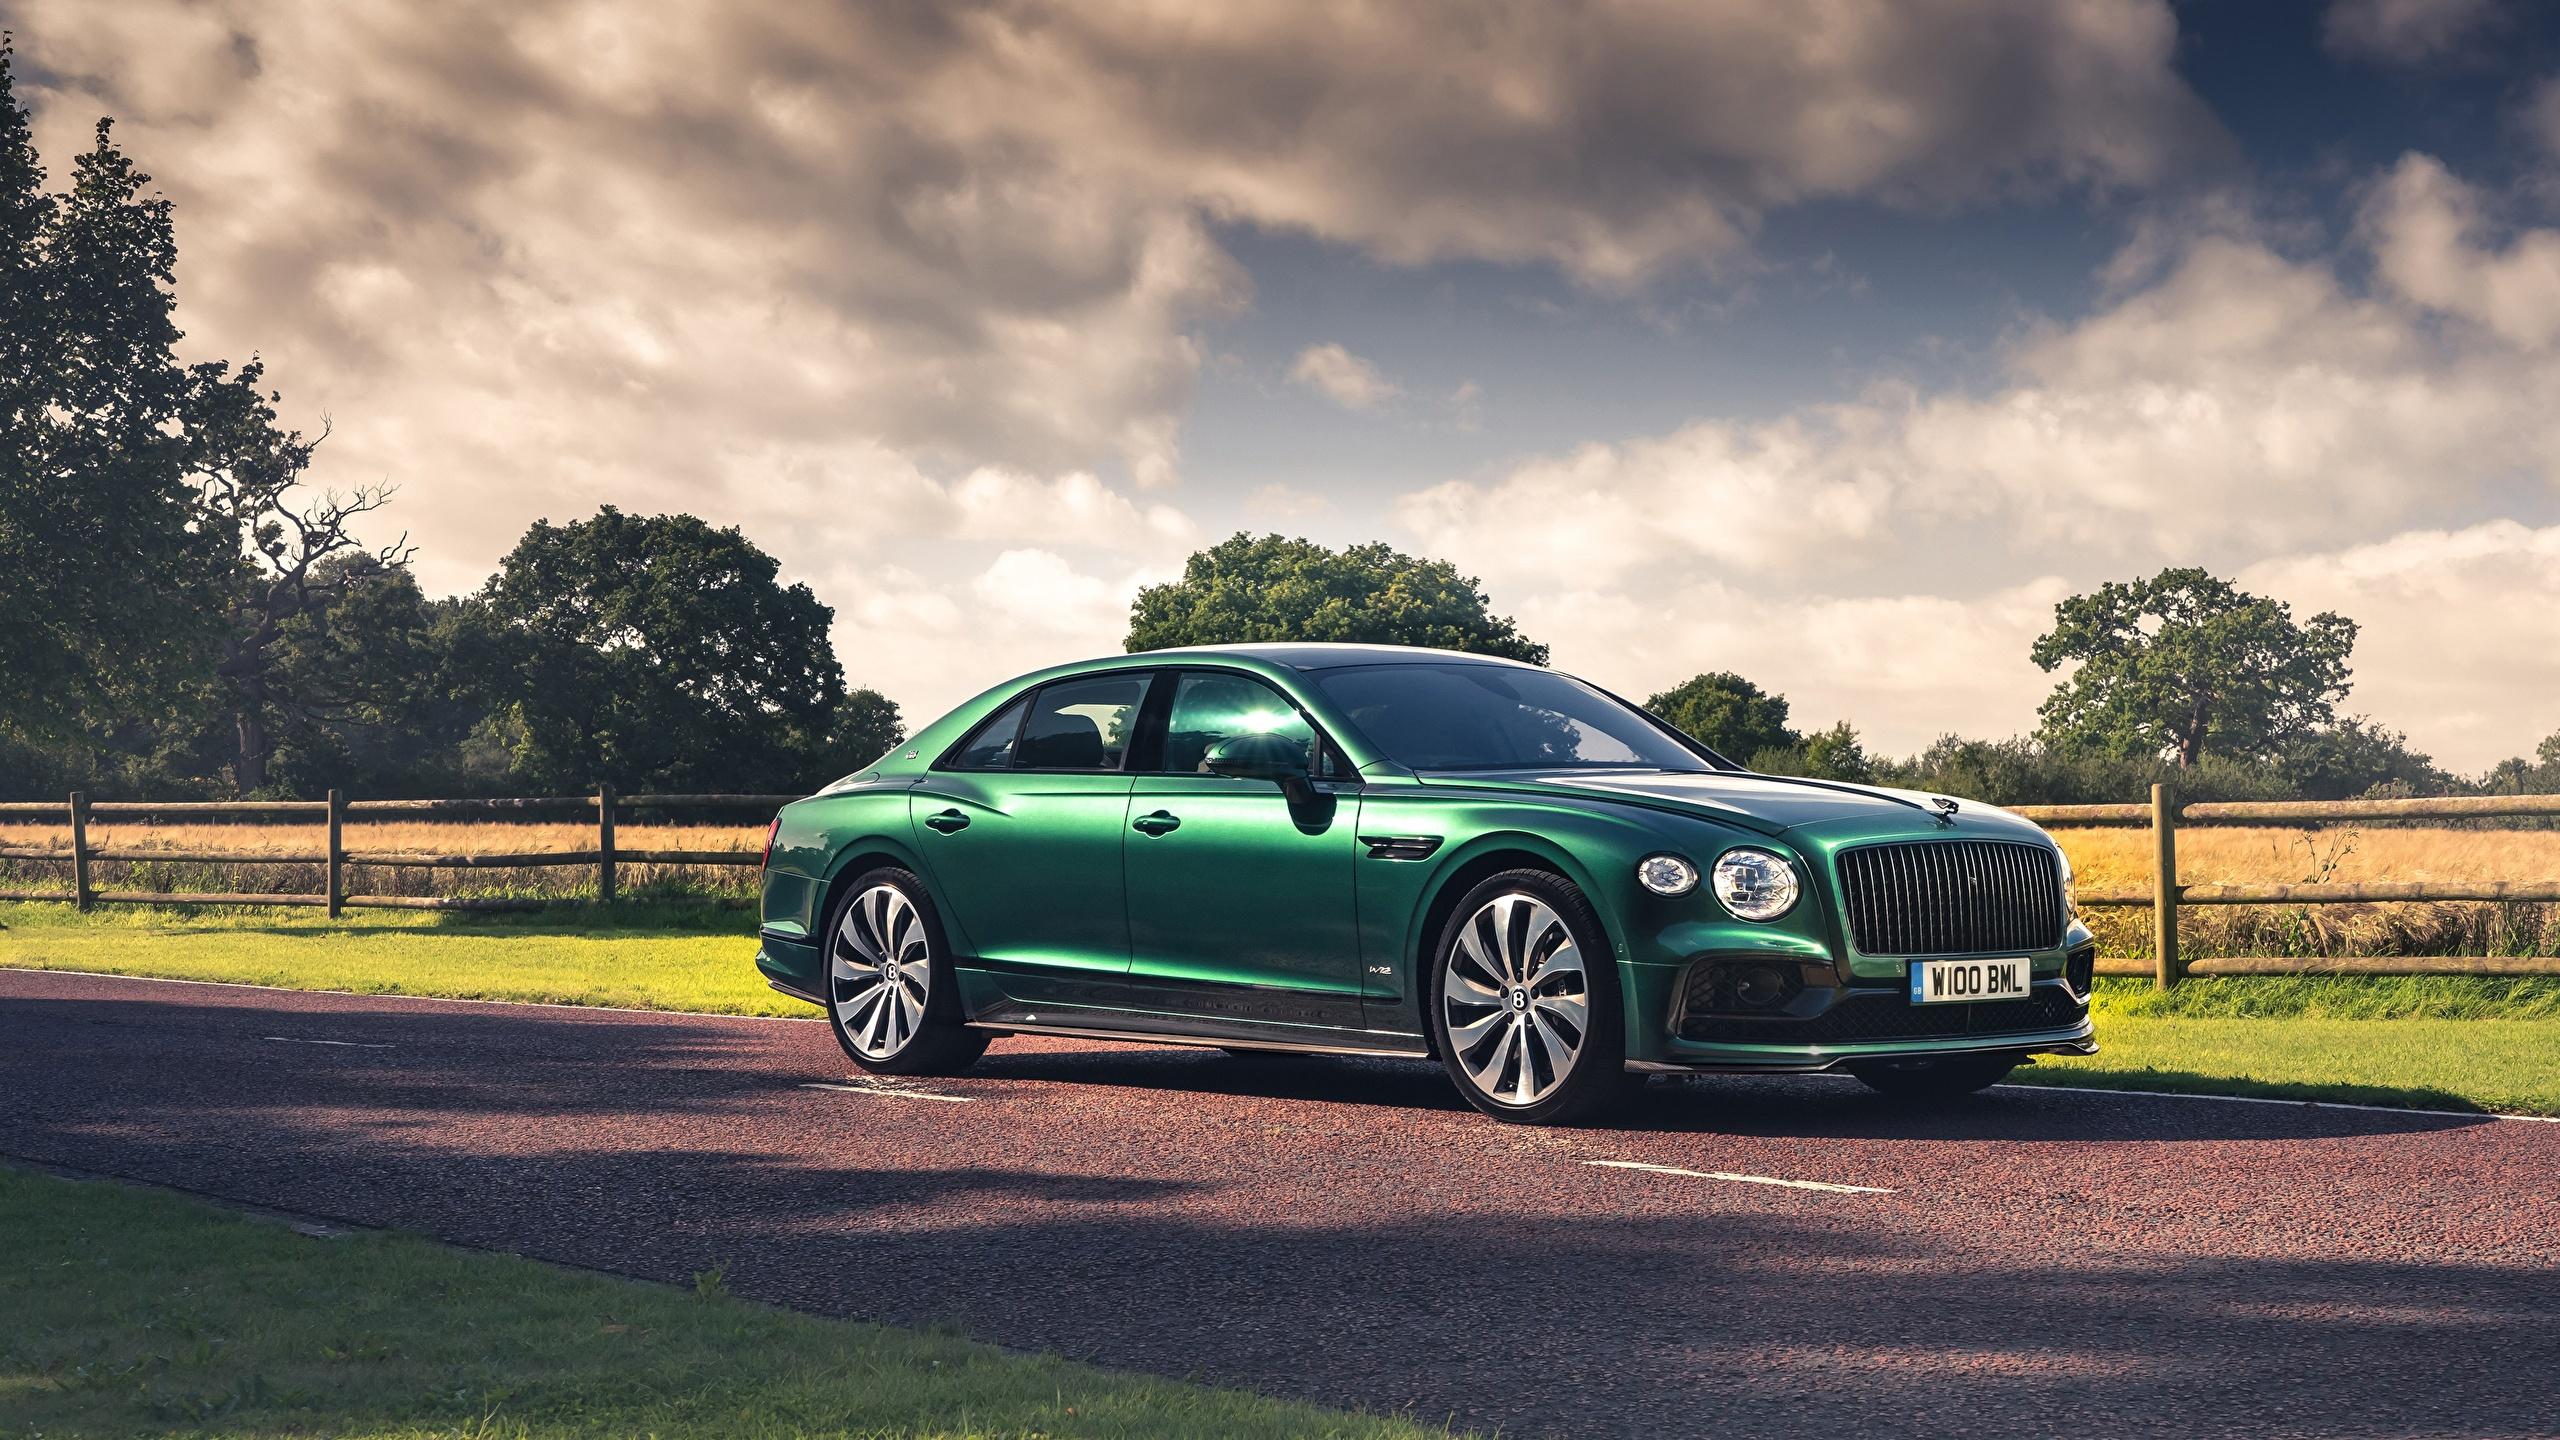 Fotos Bentley Flying Spur, Styling Specification, UK-spec, 2020 Limousine Grün Autos Seitlich 2560x1440 auto automobil